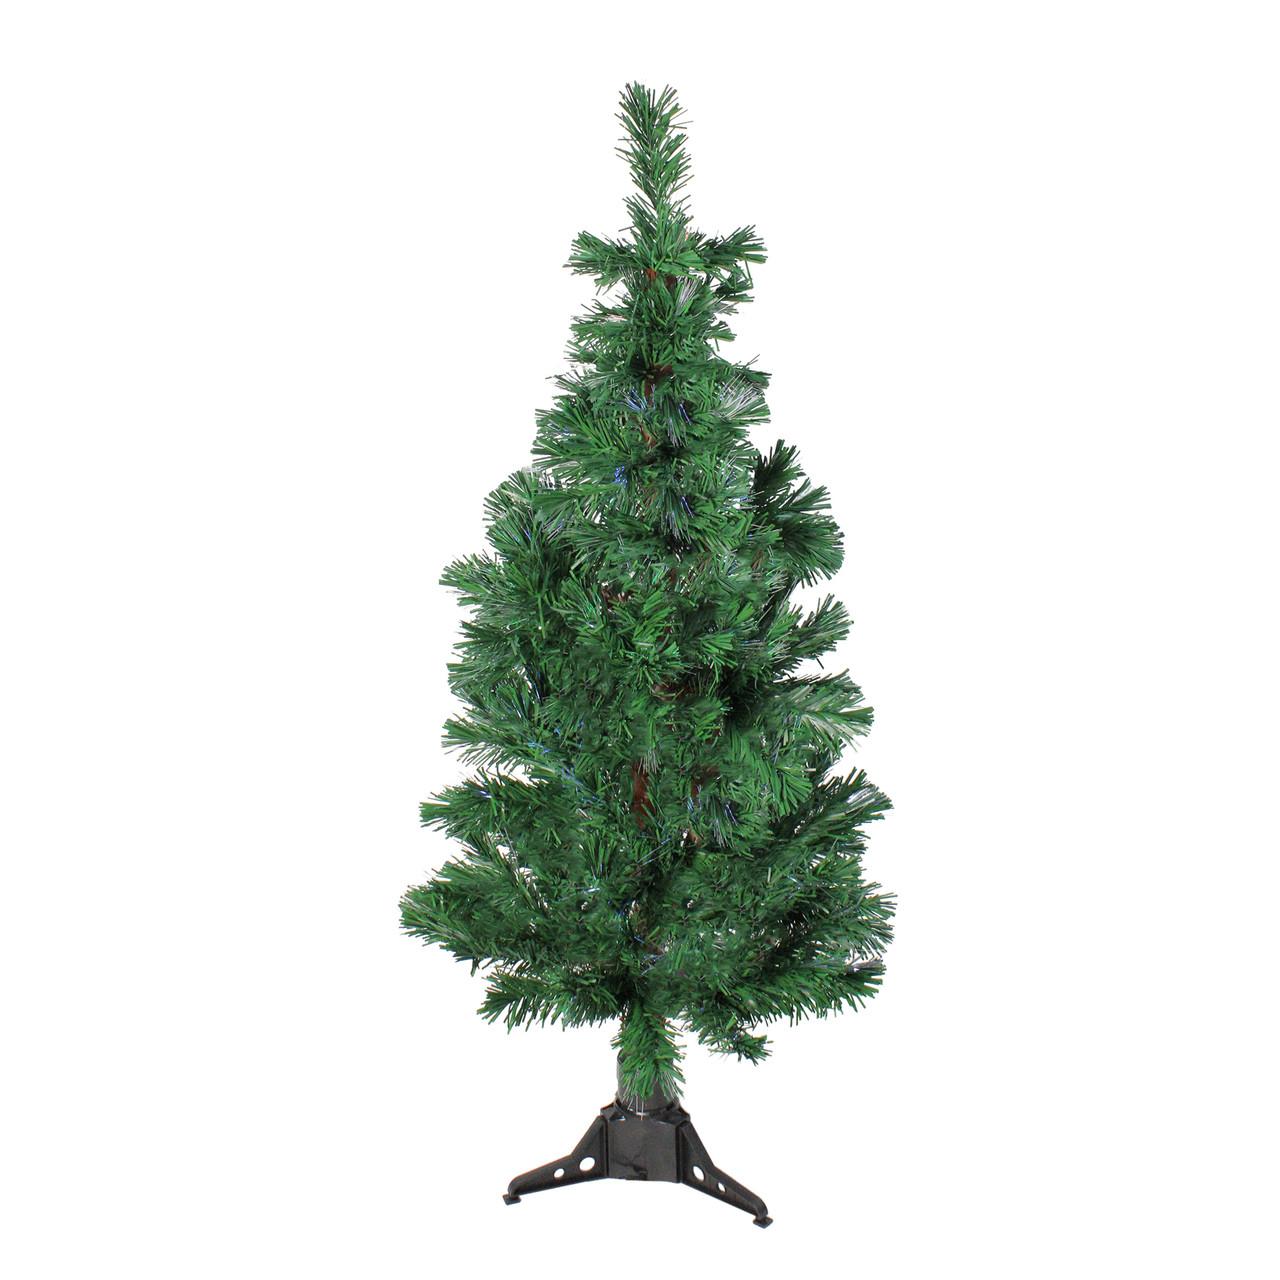 Christmas Tree Fiber Optic Lights: 4' Pre-Lit Fiber Optic Artificial Spiral Pine Christmas